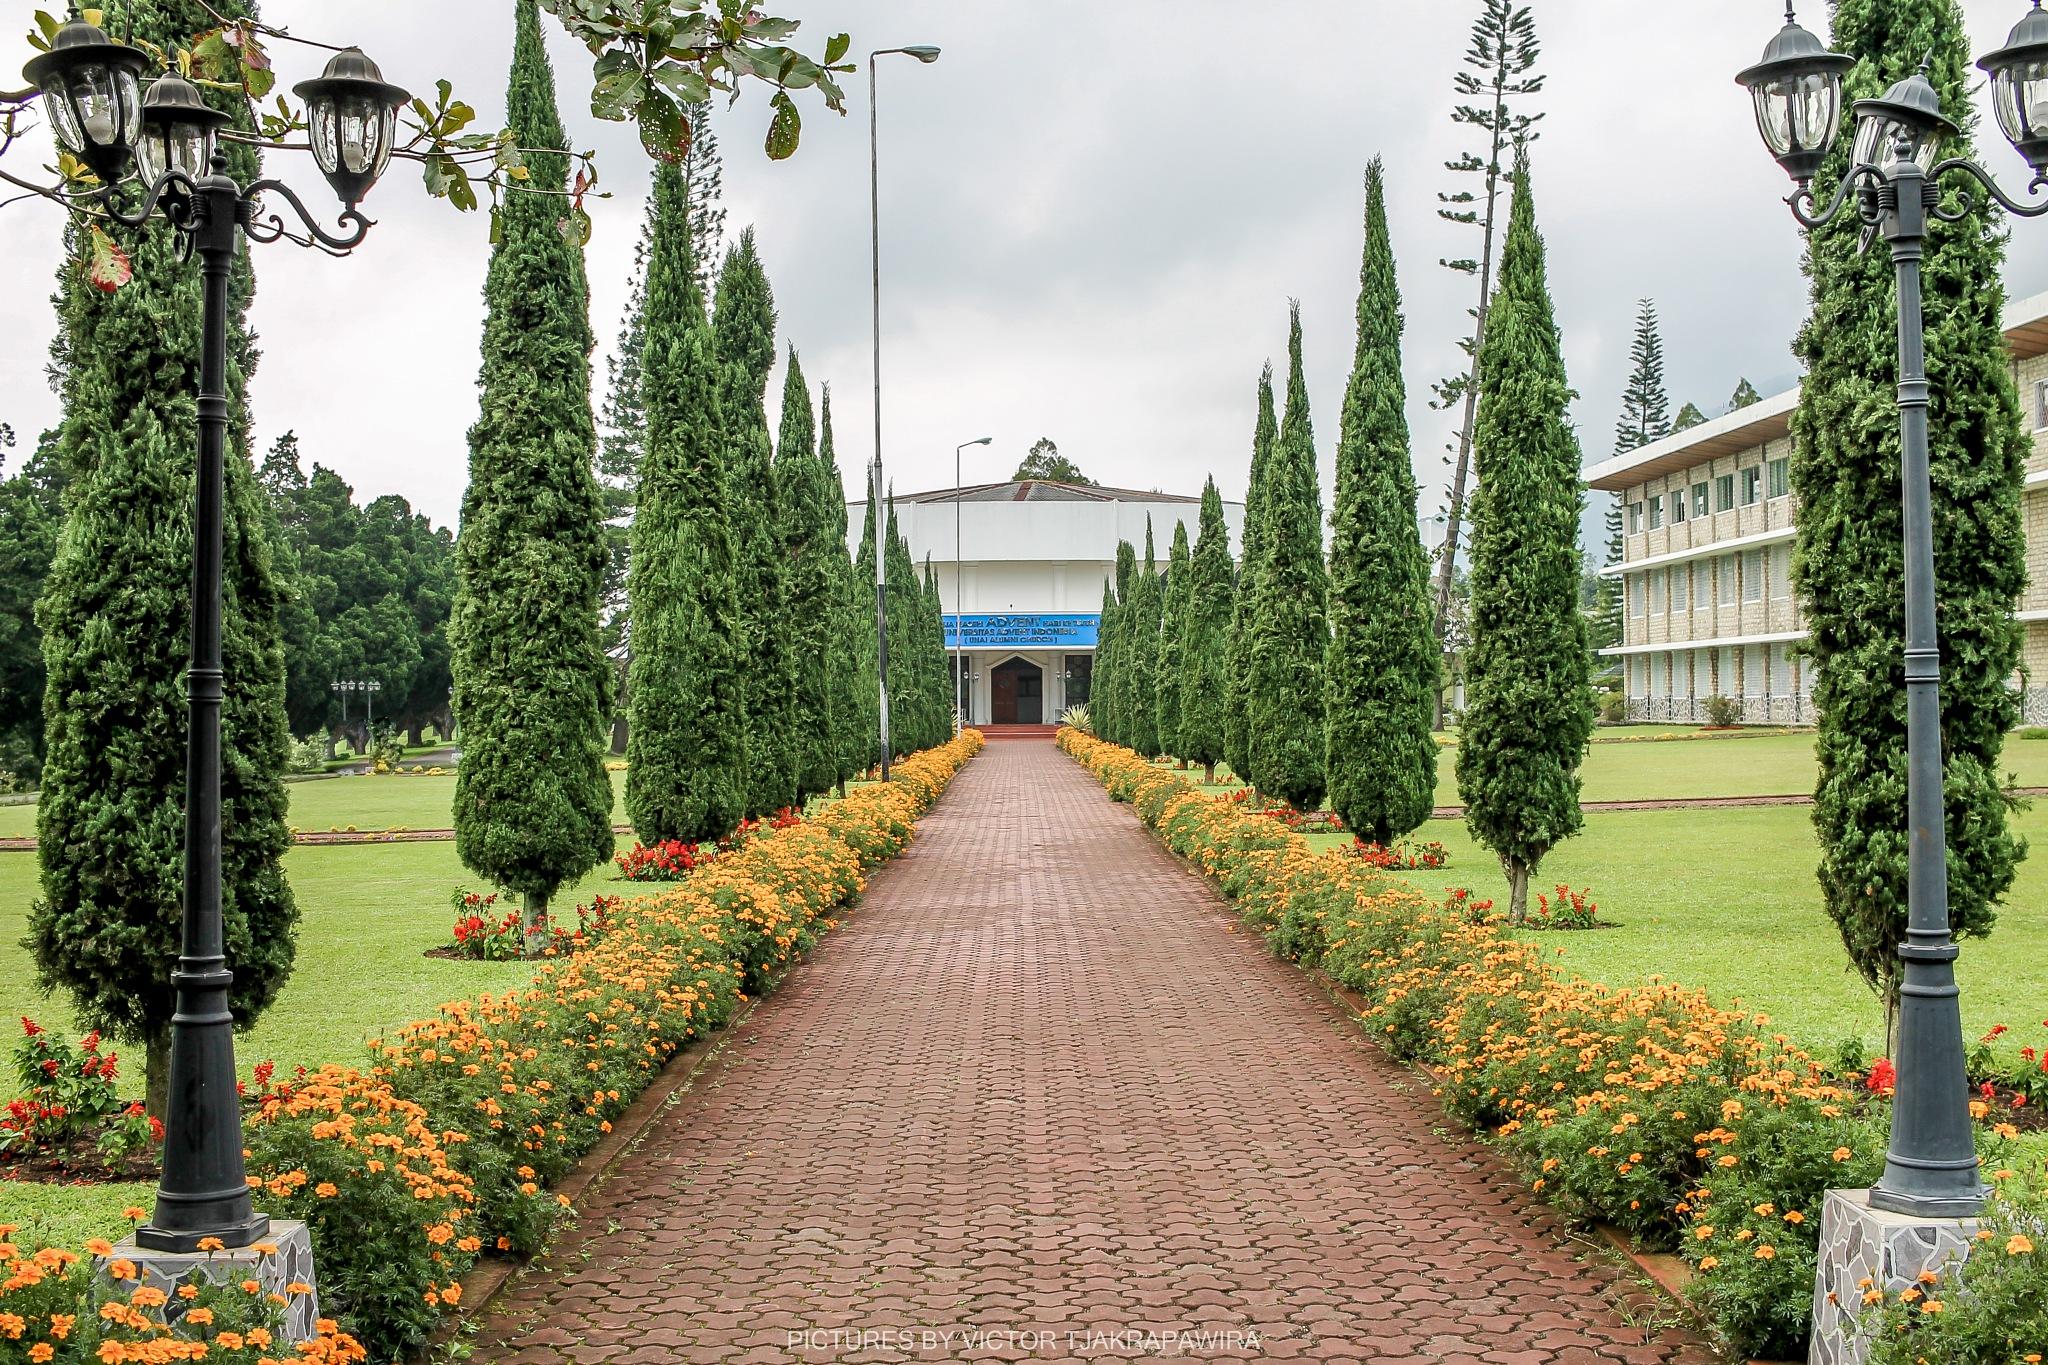 Green Campus by Victor Mattathias Noli Tjakrapawira